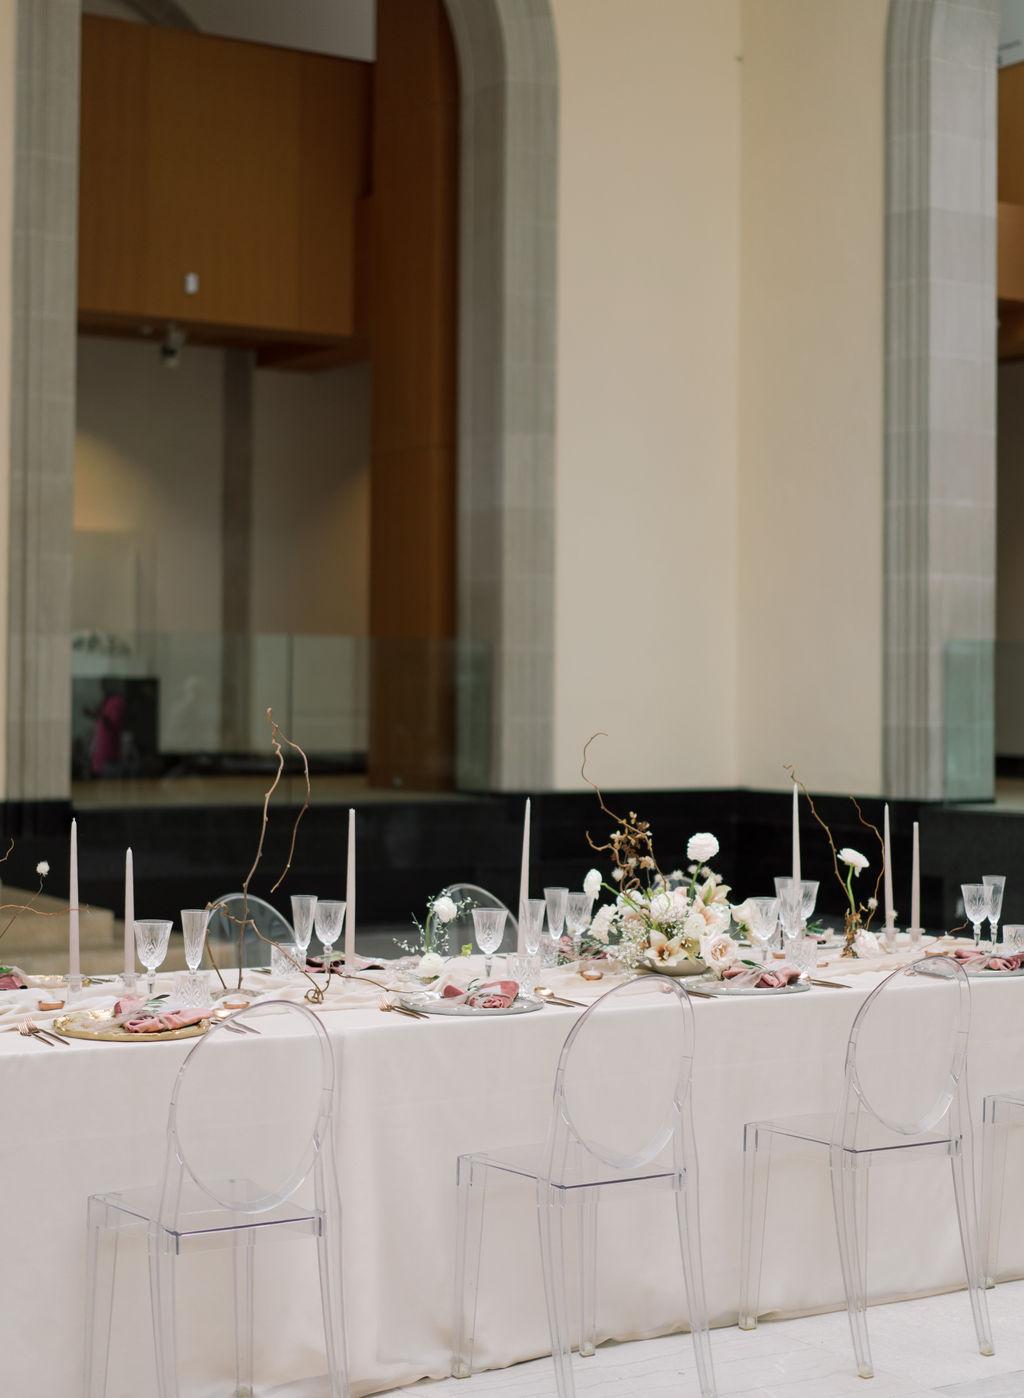 artiese-ago-wedding-editorial-06604.jpg